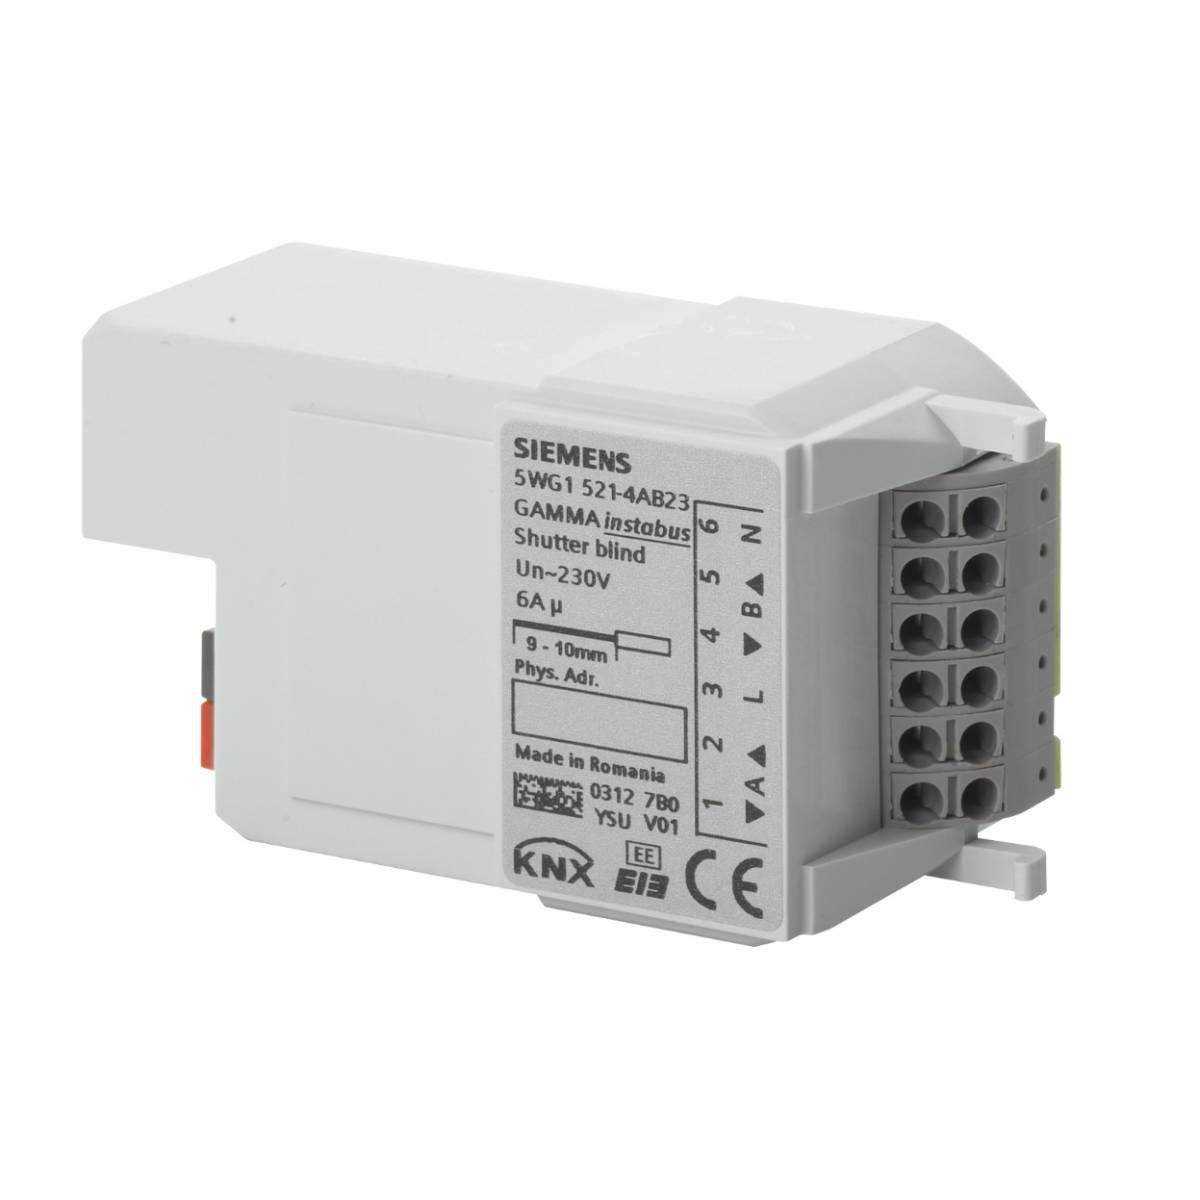 Shutter Actuator' 2 x AC 230 V' 6 A